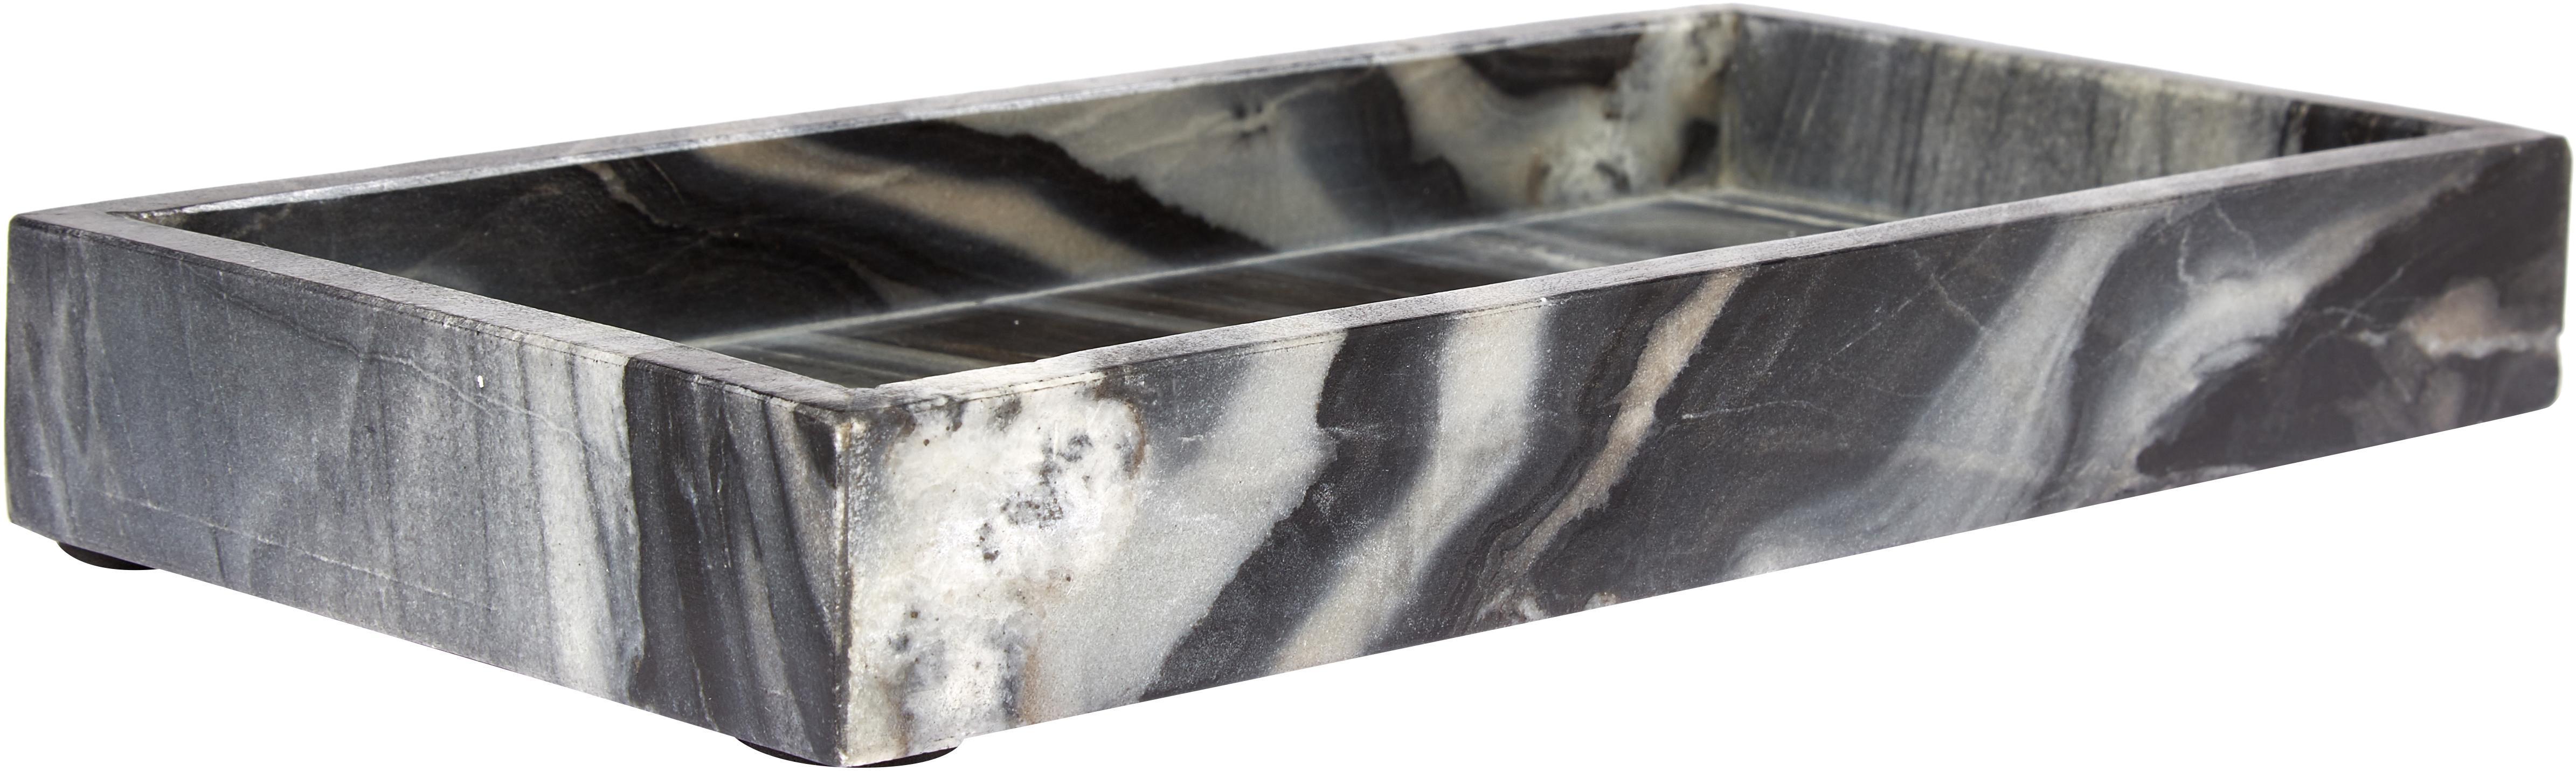 Marmor-Tablett Bifrost, Marmor, Grau, marmoriert, B 30 x T 15 cm